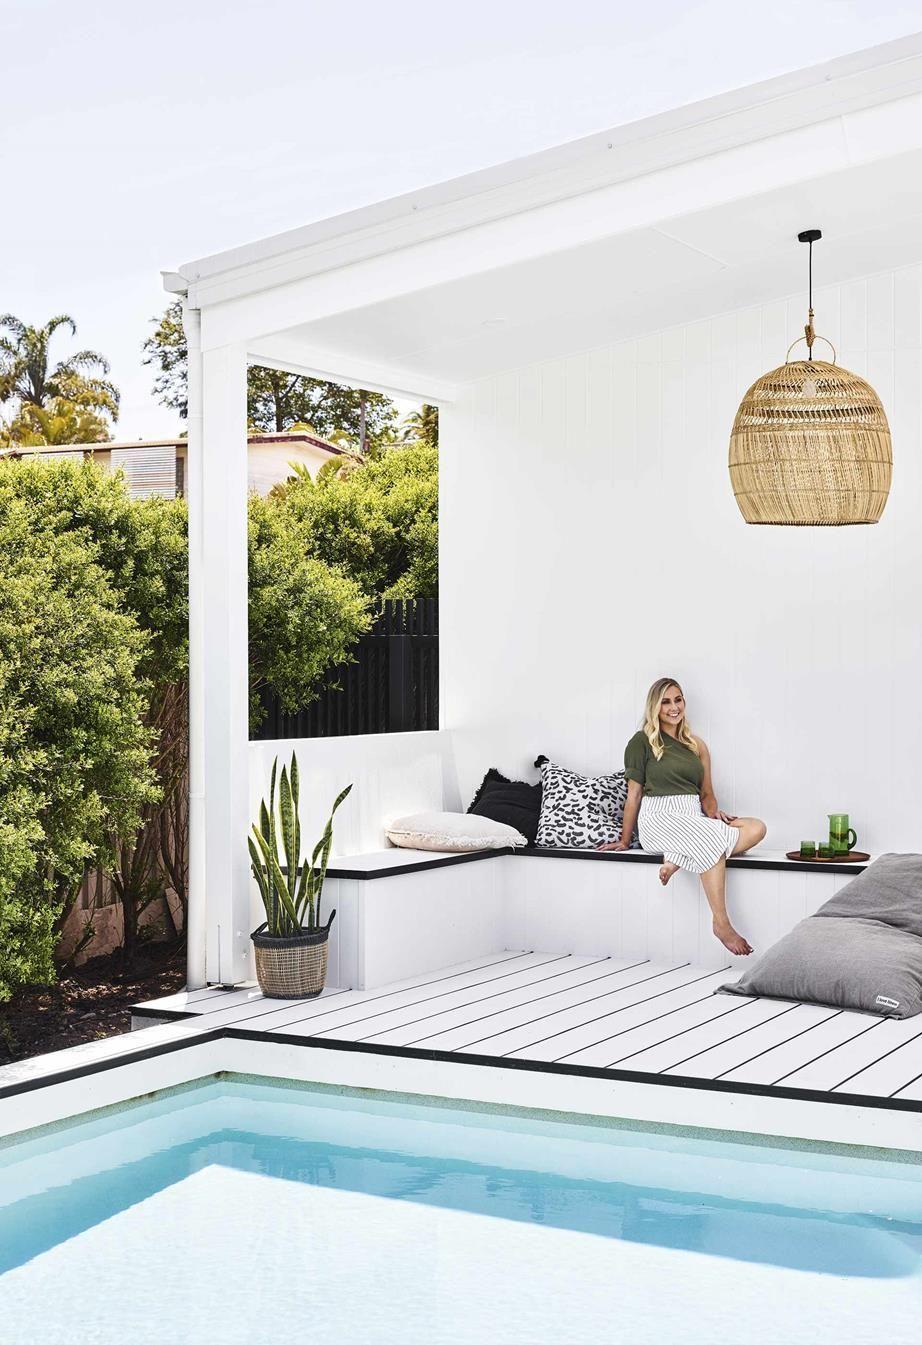 A Queensland Pool House With New York Loft Style Swimming Pools Backyard Pool Gazebo Pool Houses